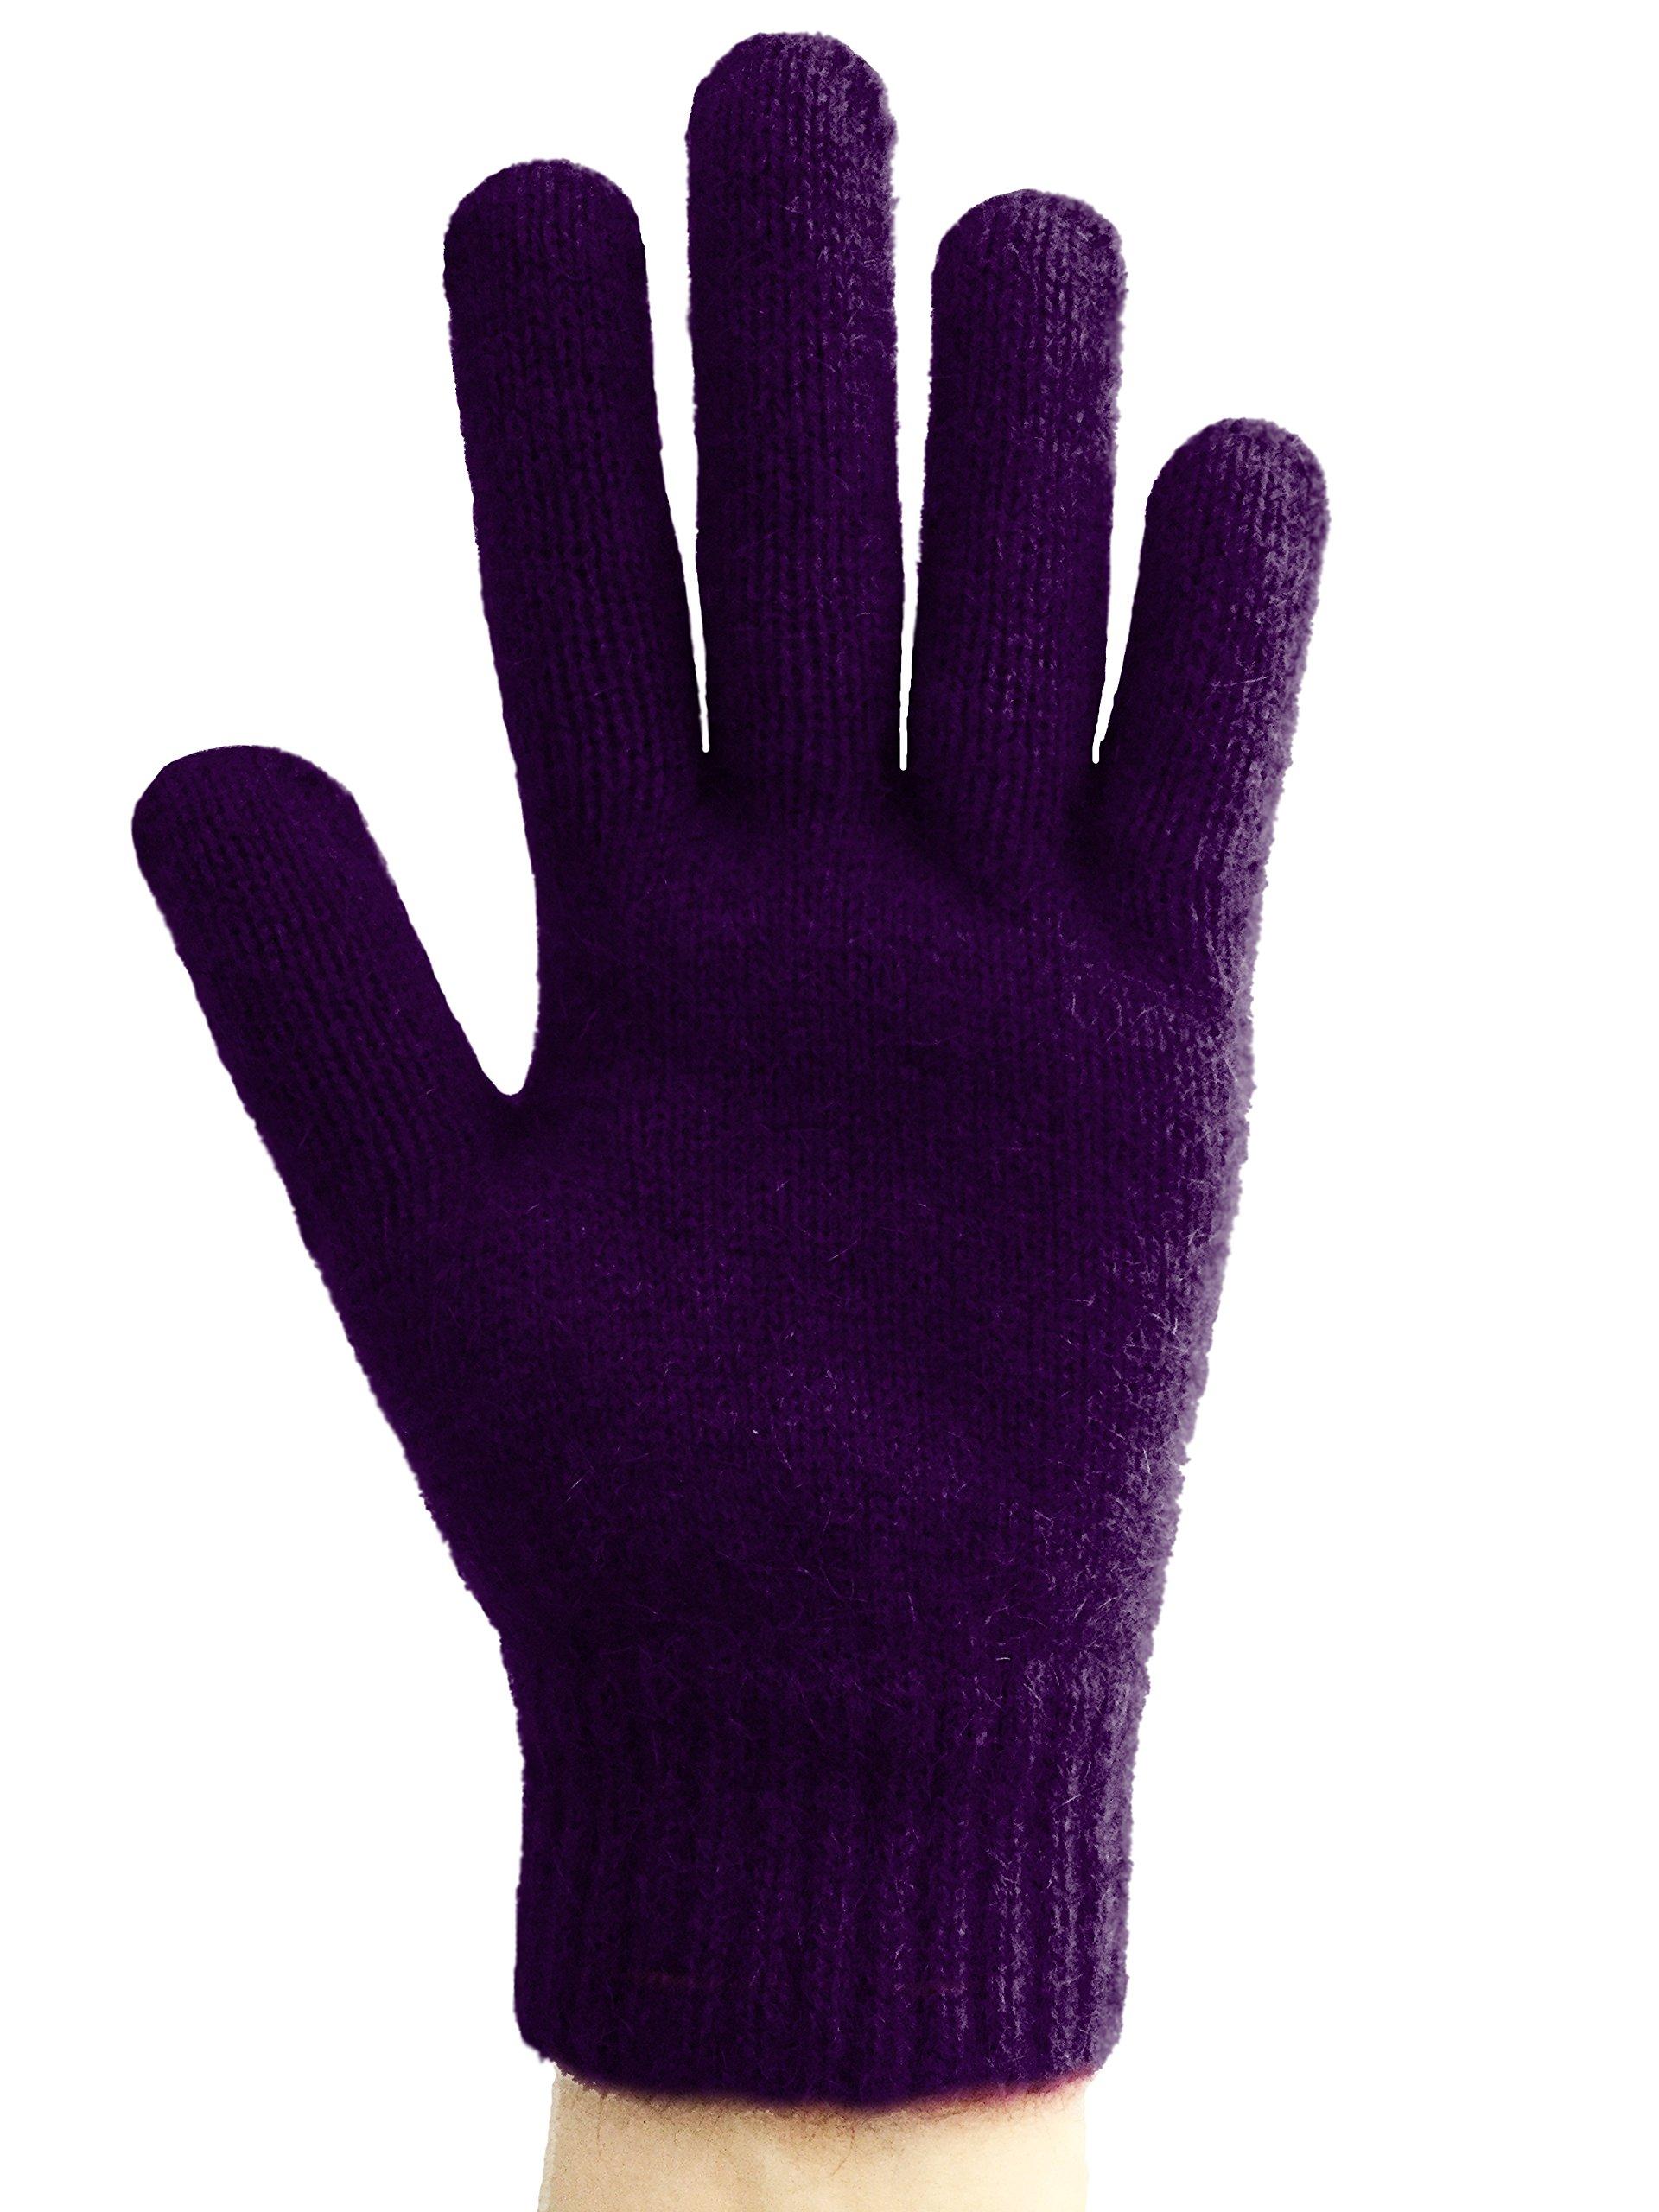 PossumDown Lightweight Brushtail Possum Merino Wool Blend Gloves (Small, Amethyst)